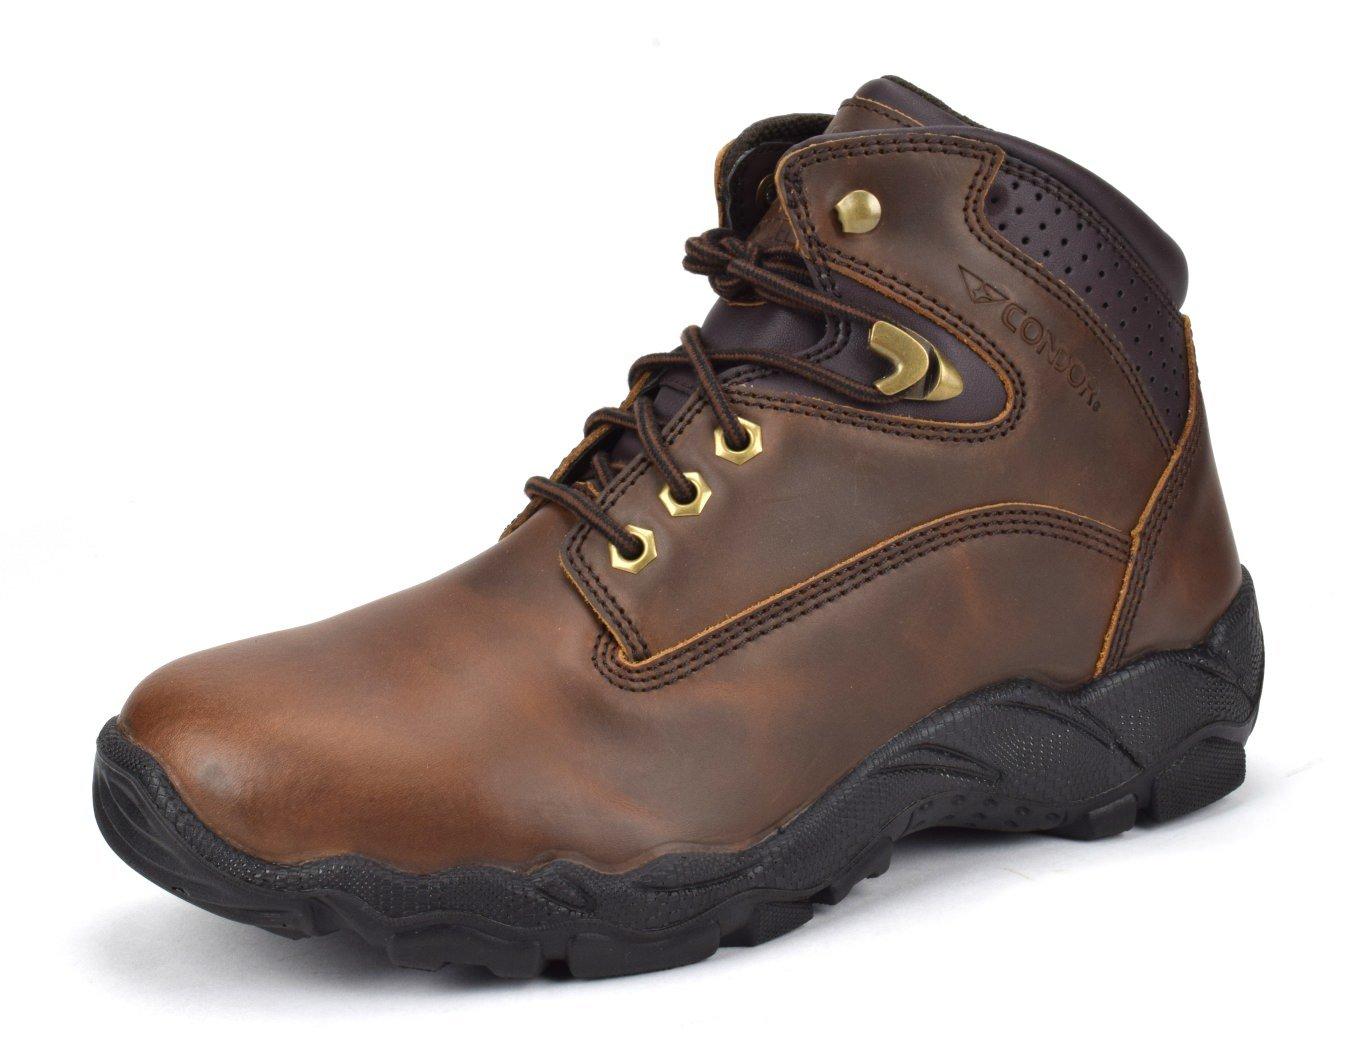 CONDOR Idaho Men's 6'' Steel Toe Work Boot - Brown, Size 10.5 E US by CONDOR